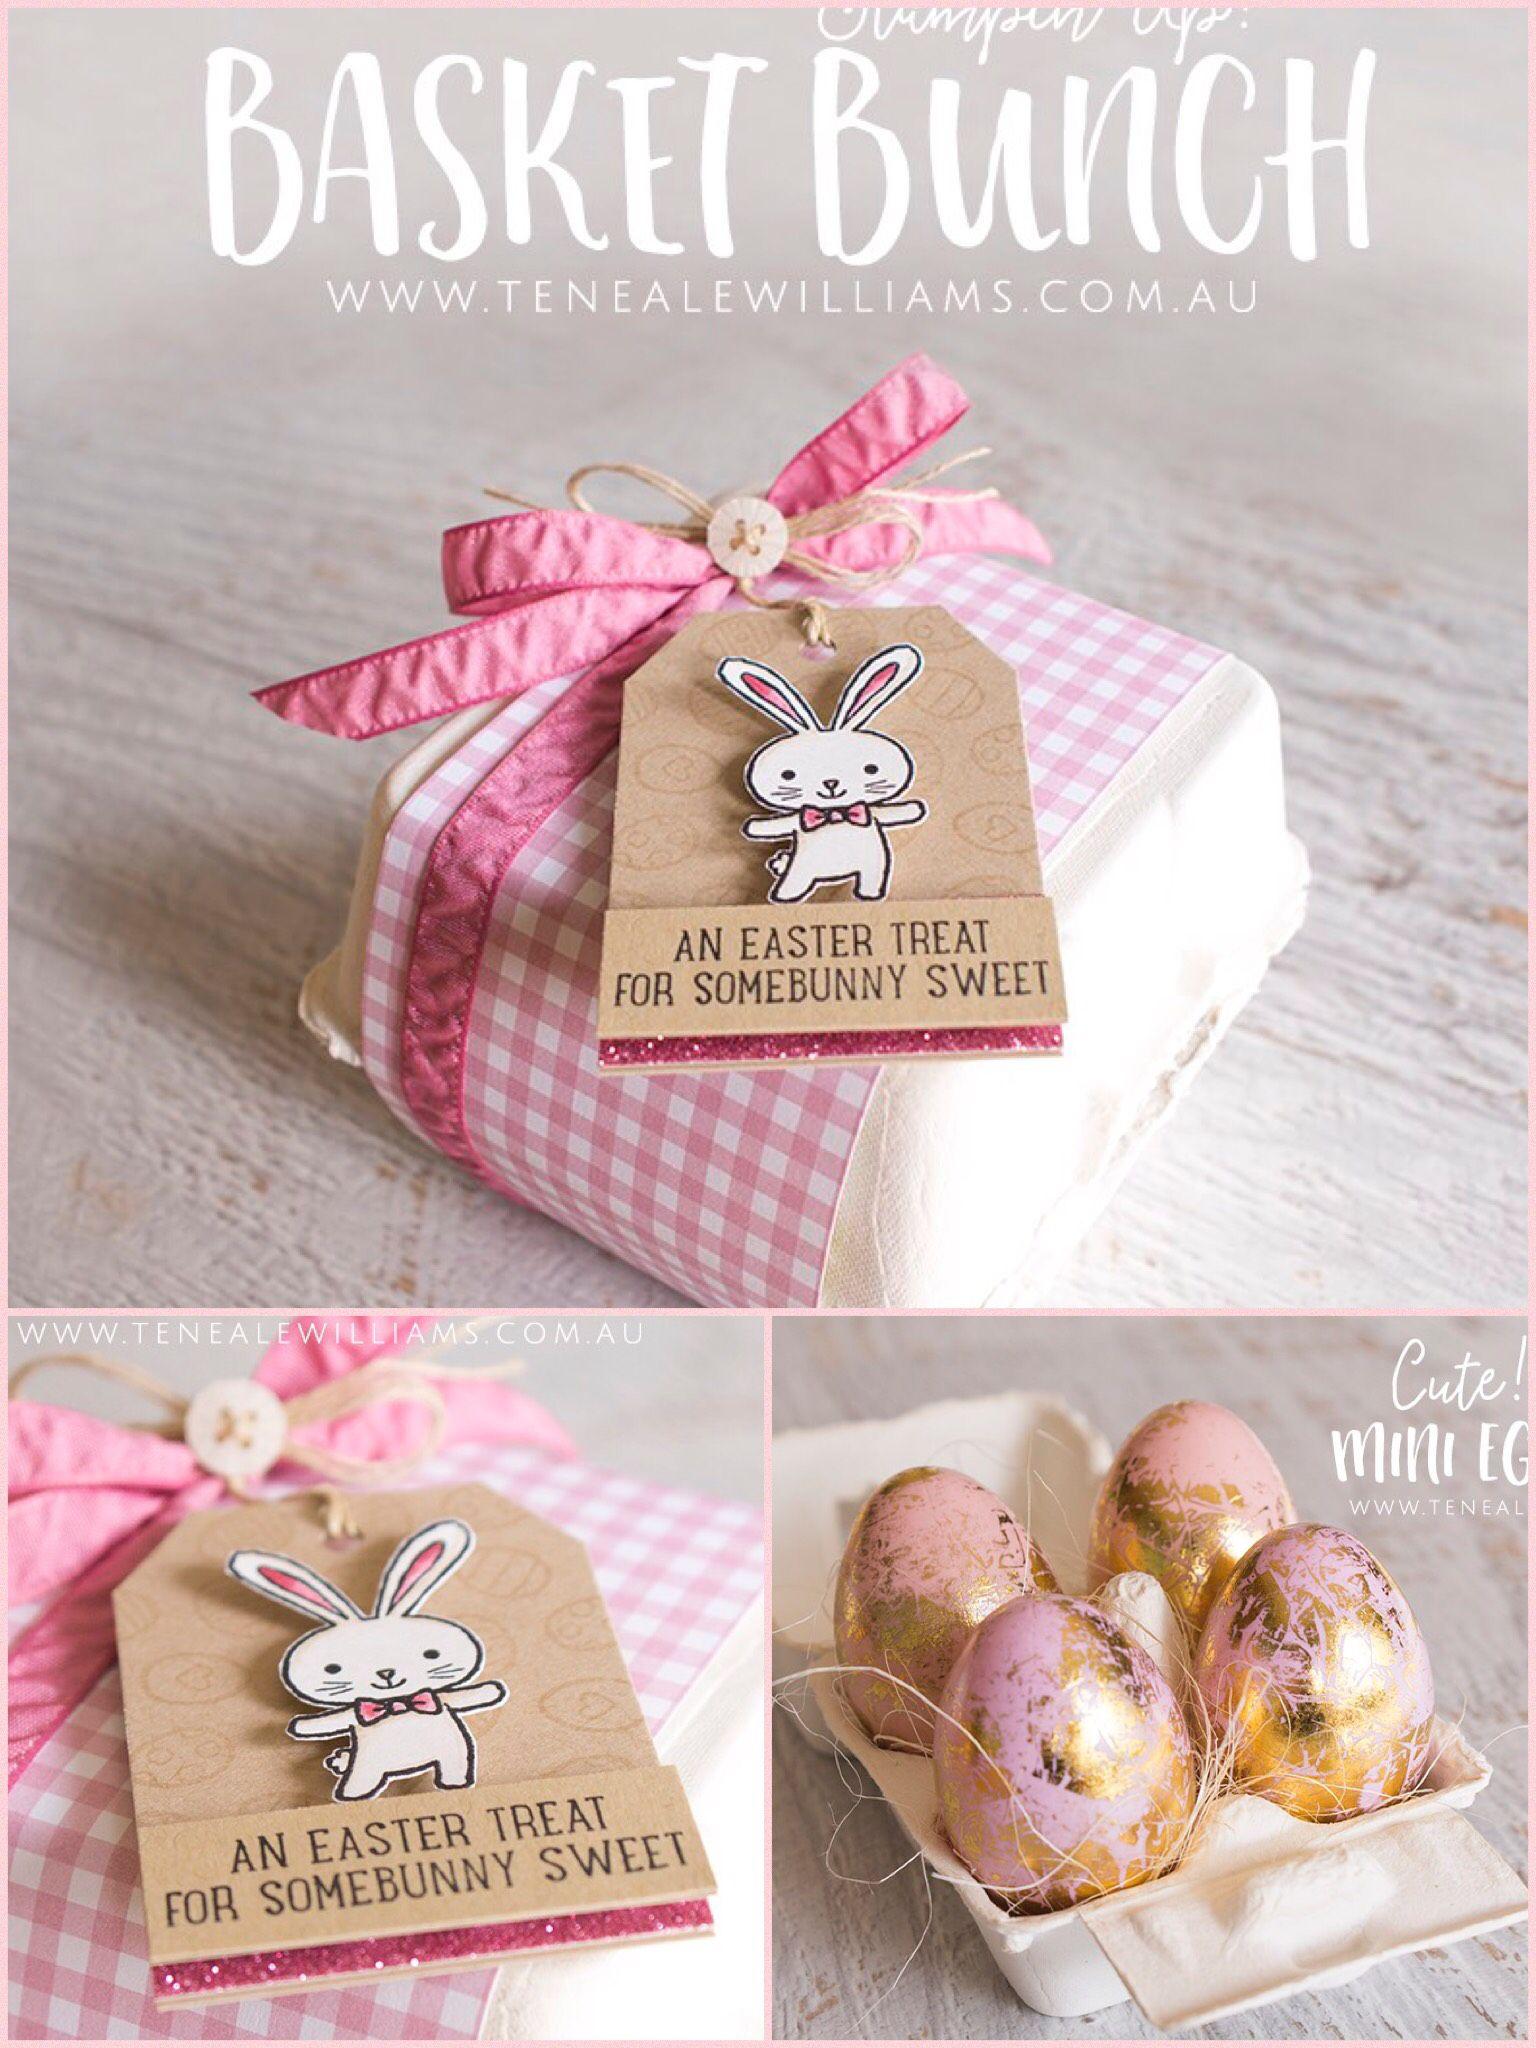 Basket Bunch Easter bunny mini egg carton